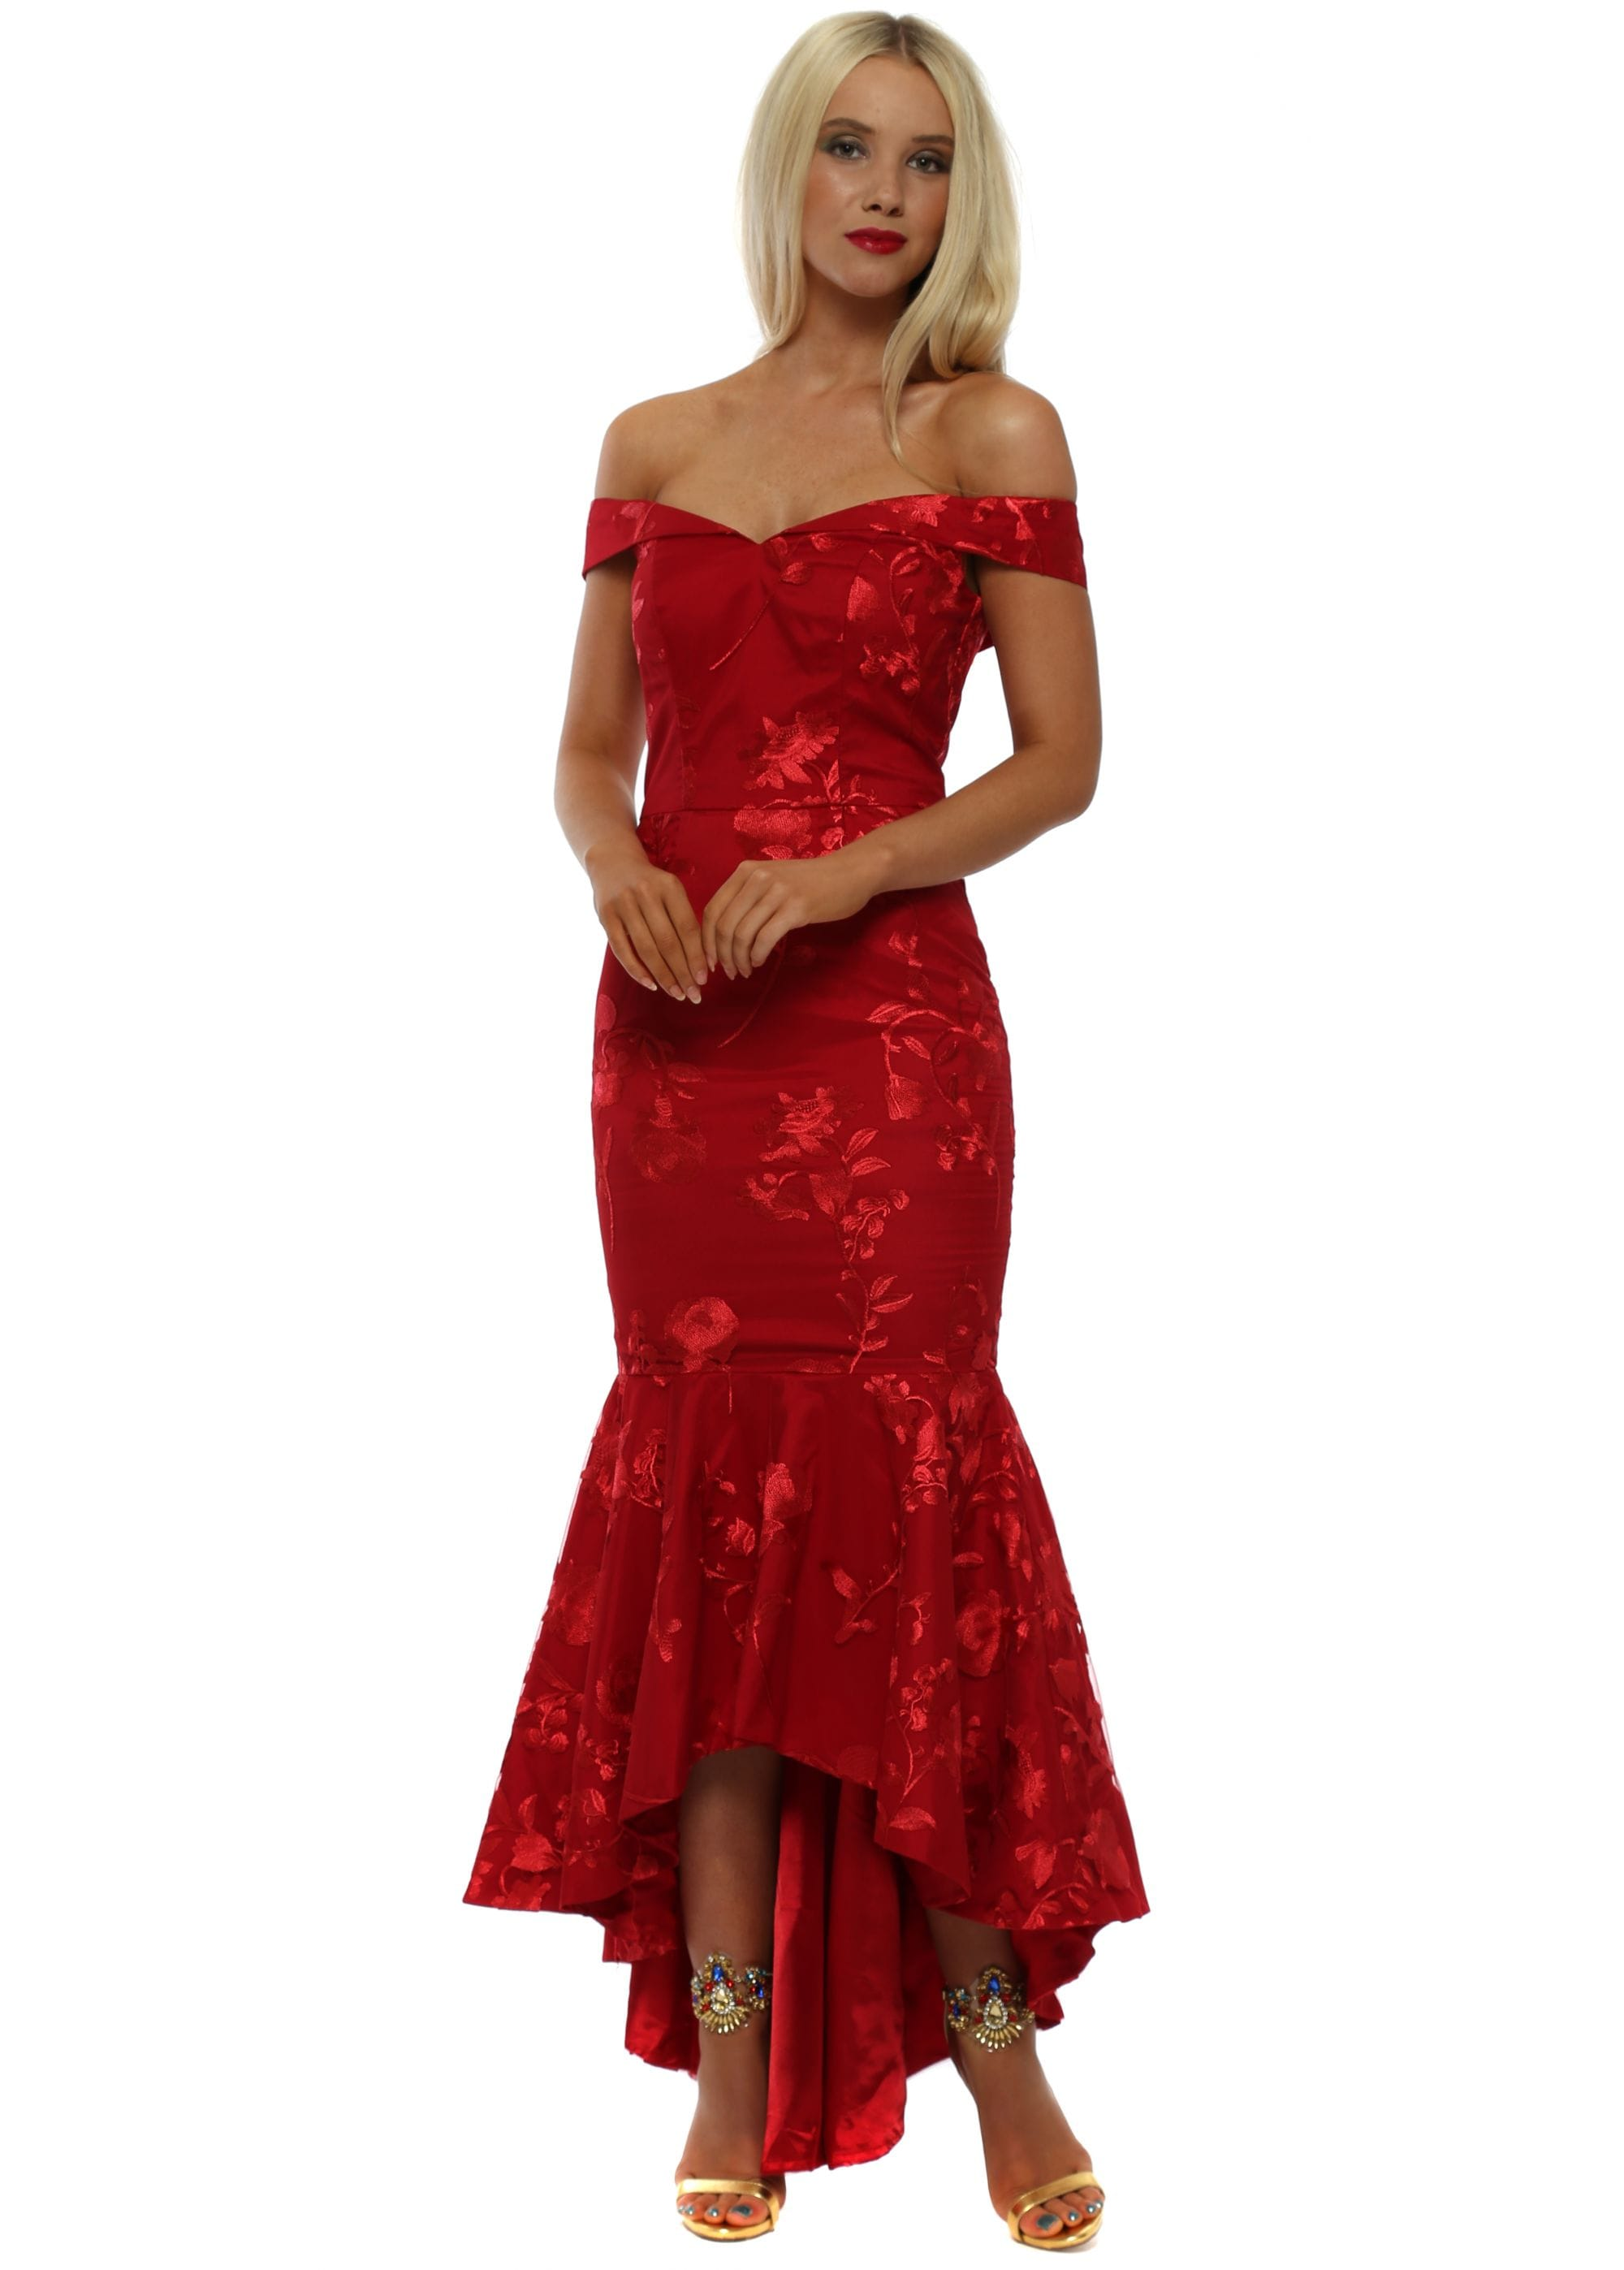 414869f6131f Chi Chi Red Lace Off The Shoulder Midi Dress